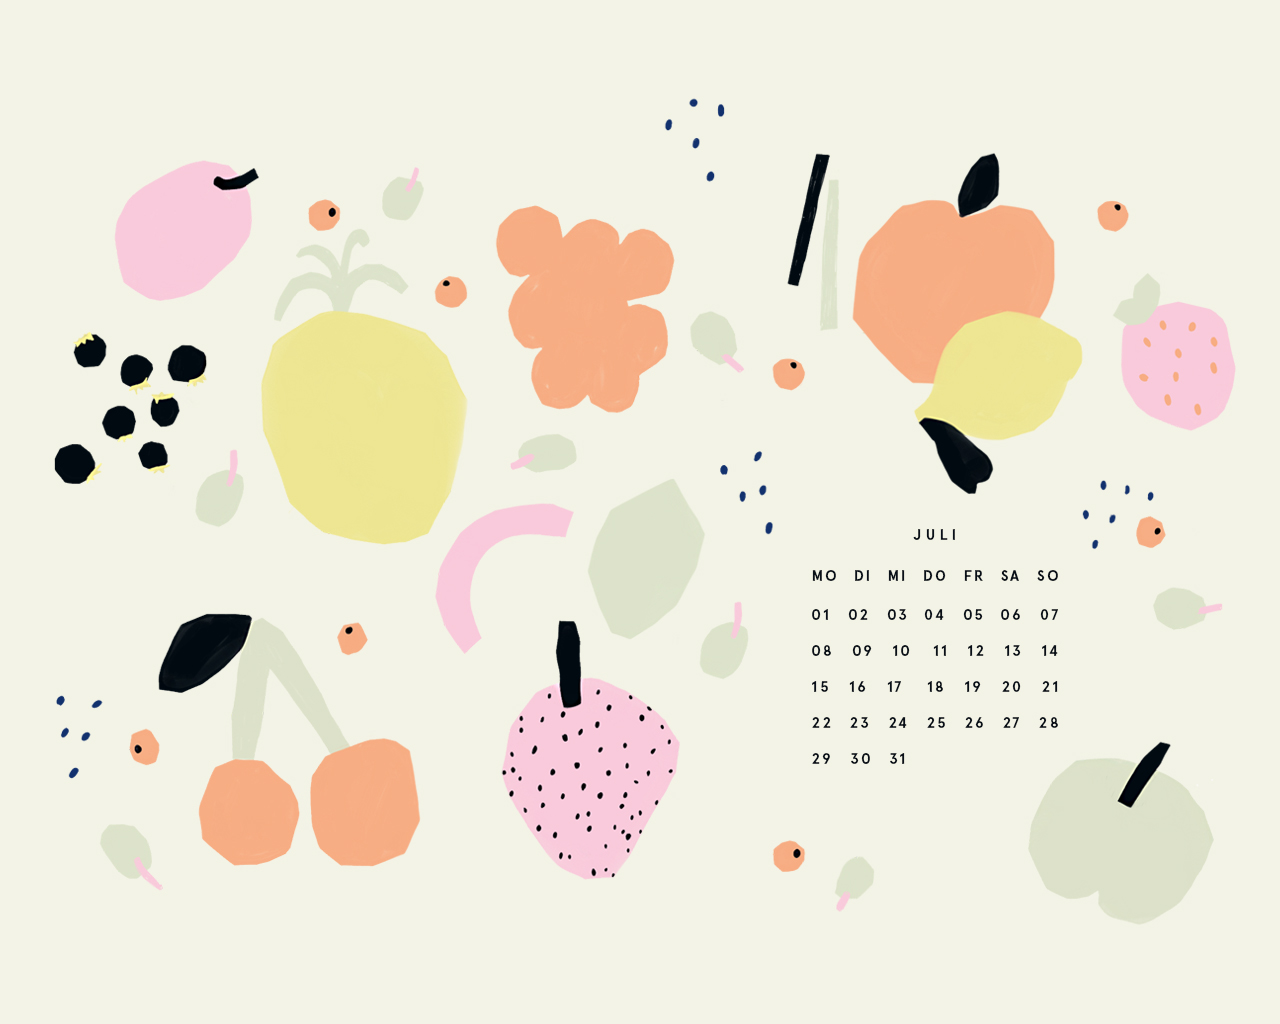 Free Desktop Wallpaper Juli 2019